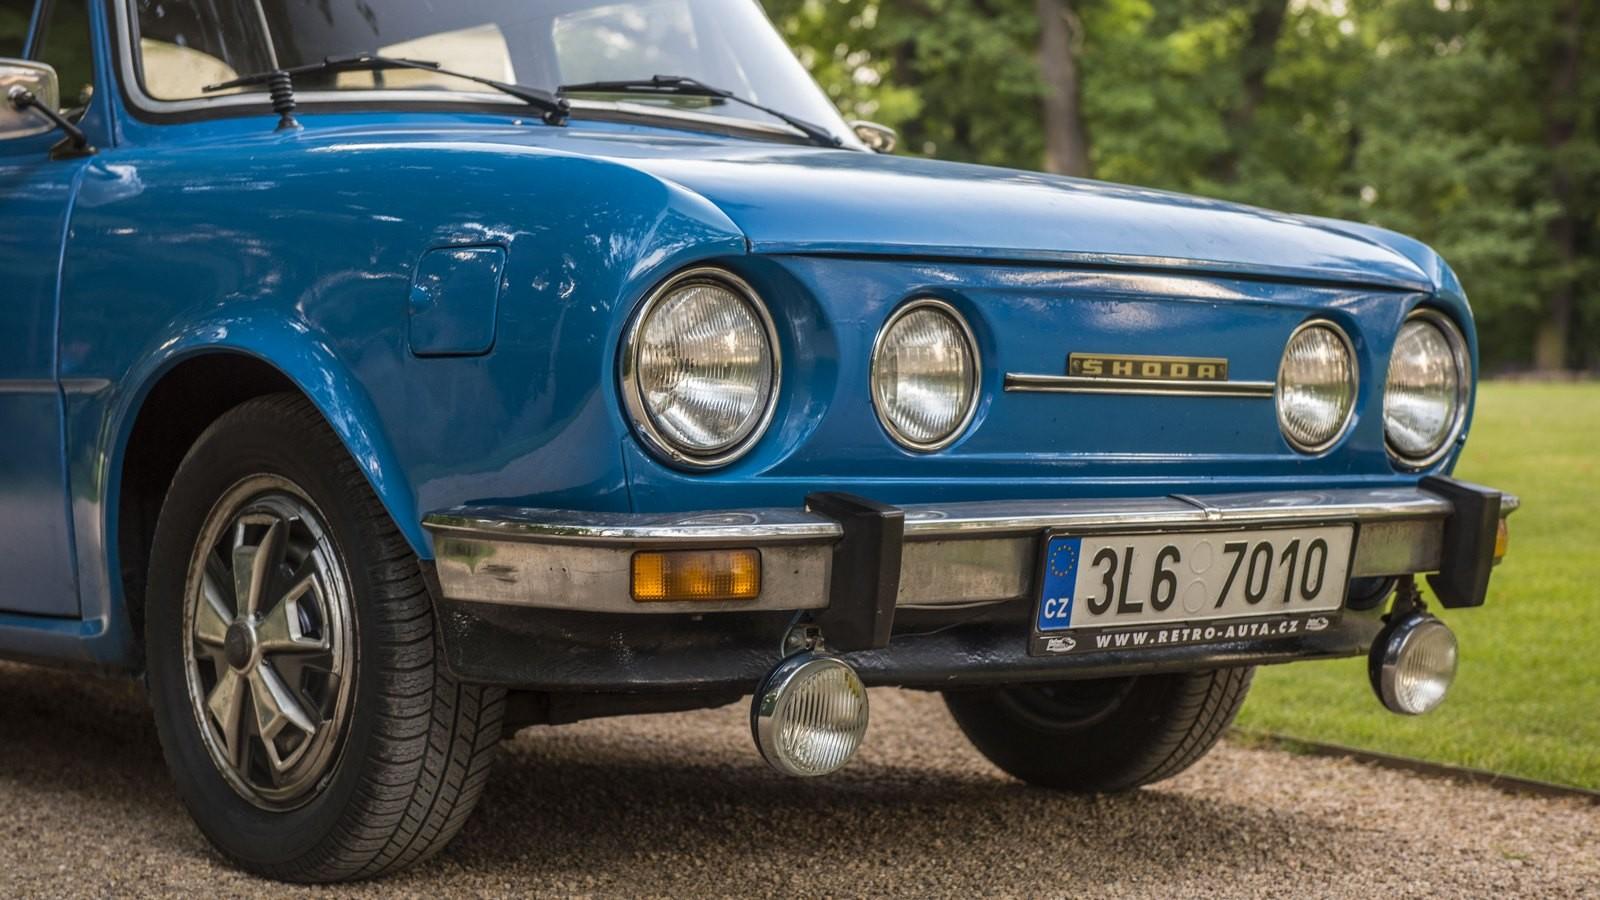 Skoda110 голубой передняя часть